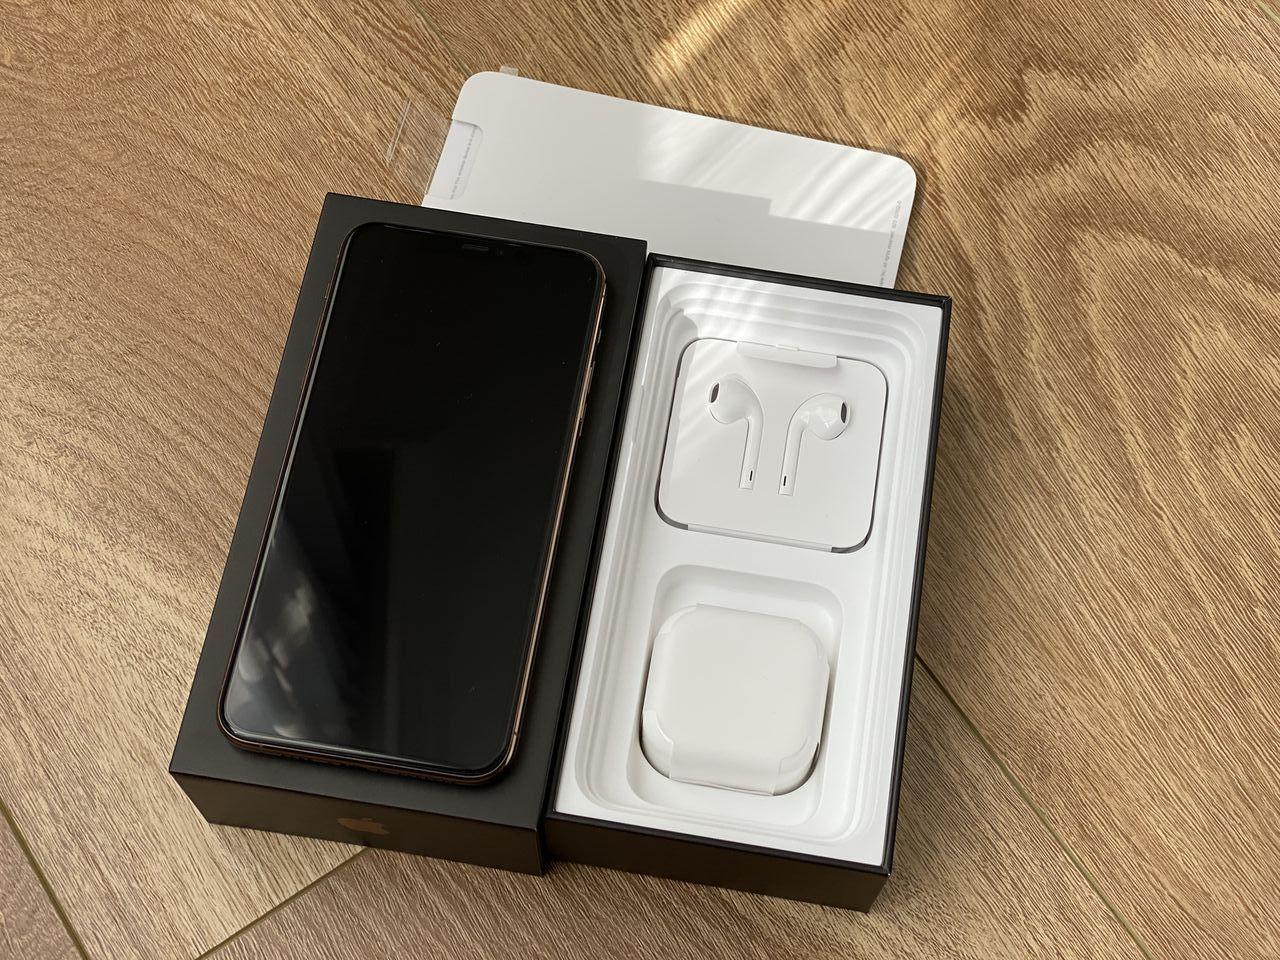 Iphone 11 Pro Max Gold 64GB Neverlocked este nou in cutie